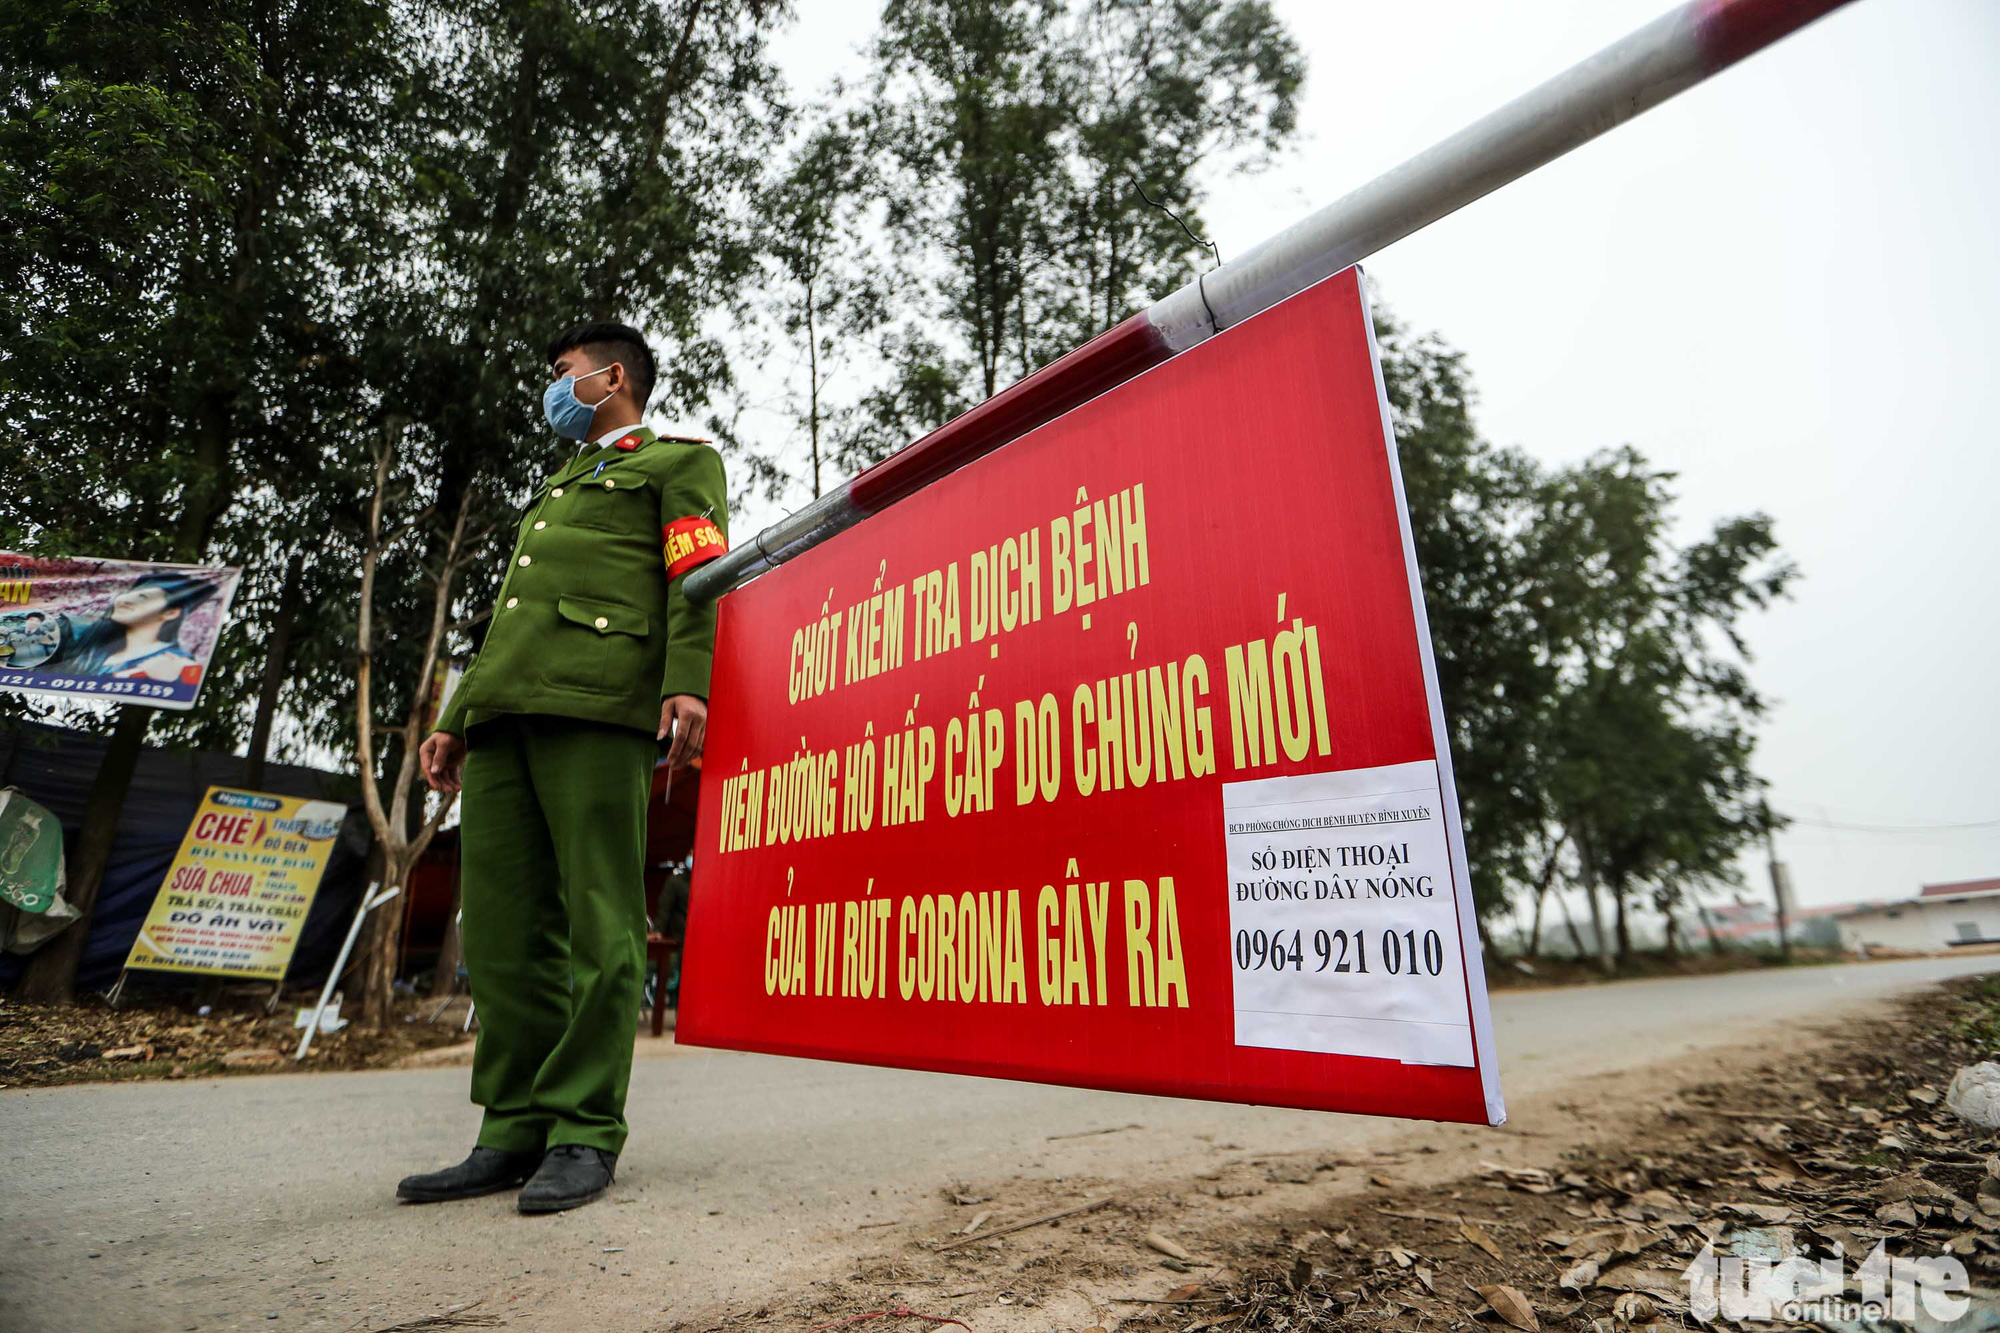 Life inside Vietnam's COVID-19 epicenter